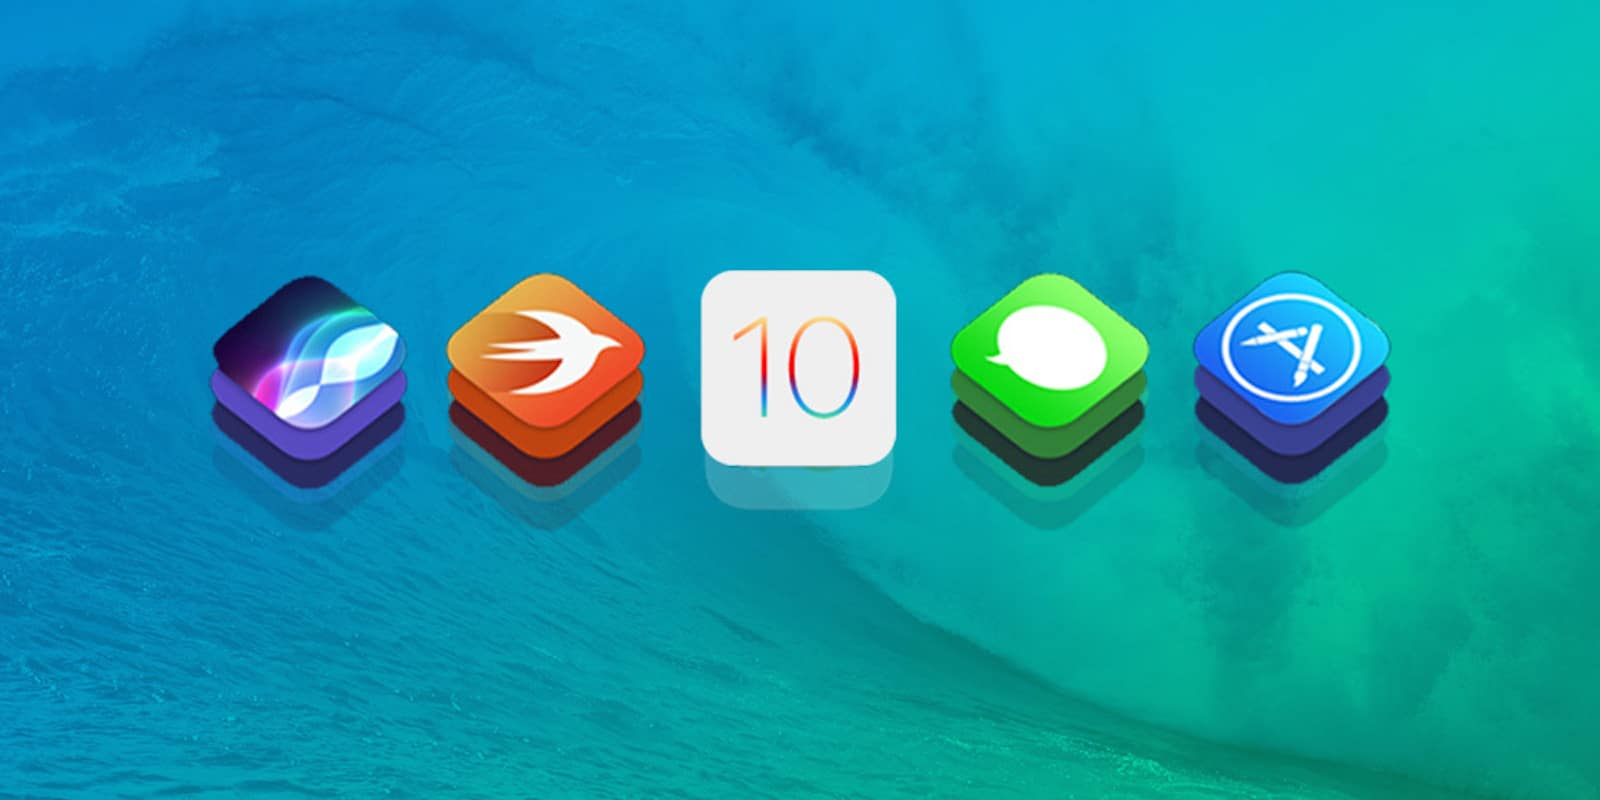 CoM - iOS 10 & Swift 3 Starter Bundle